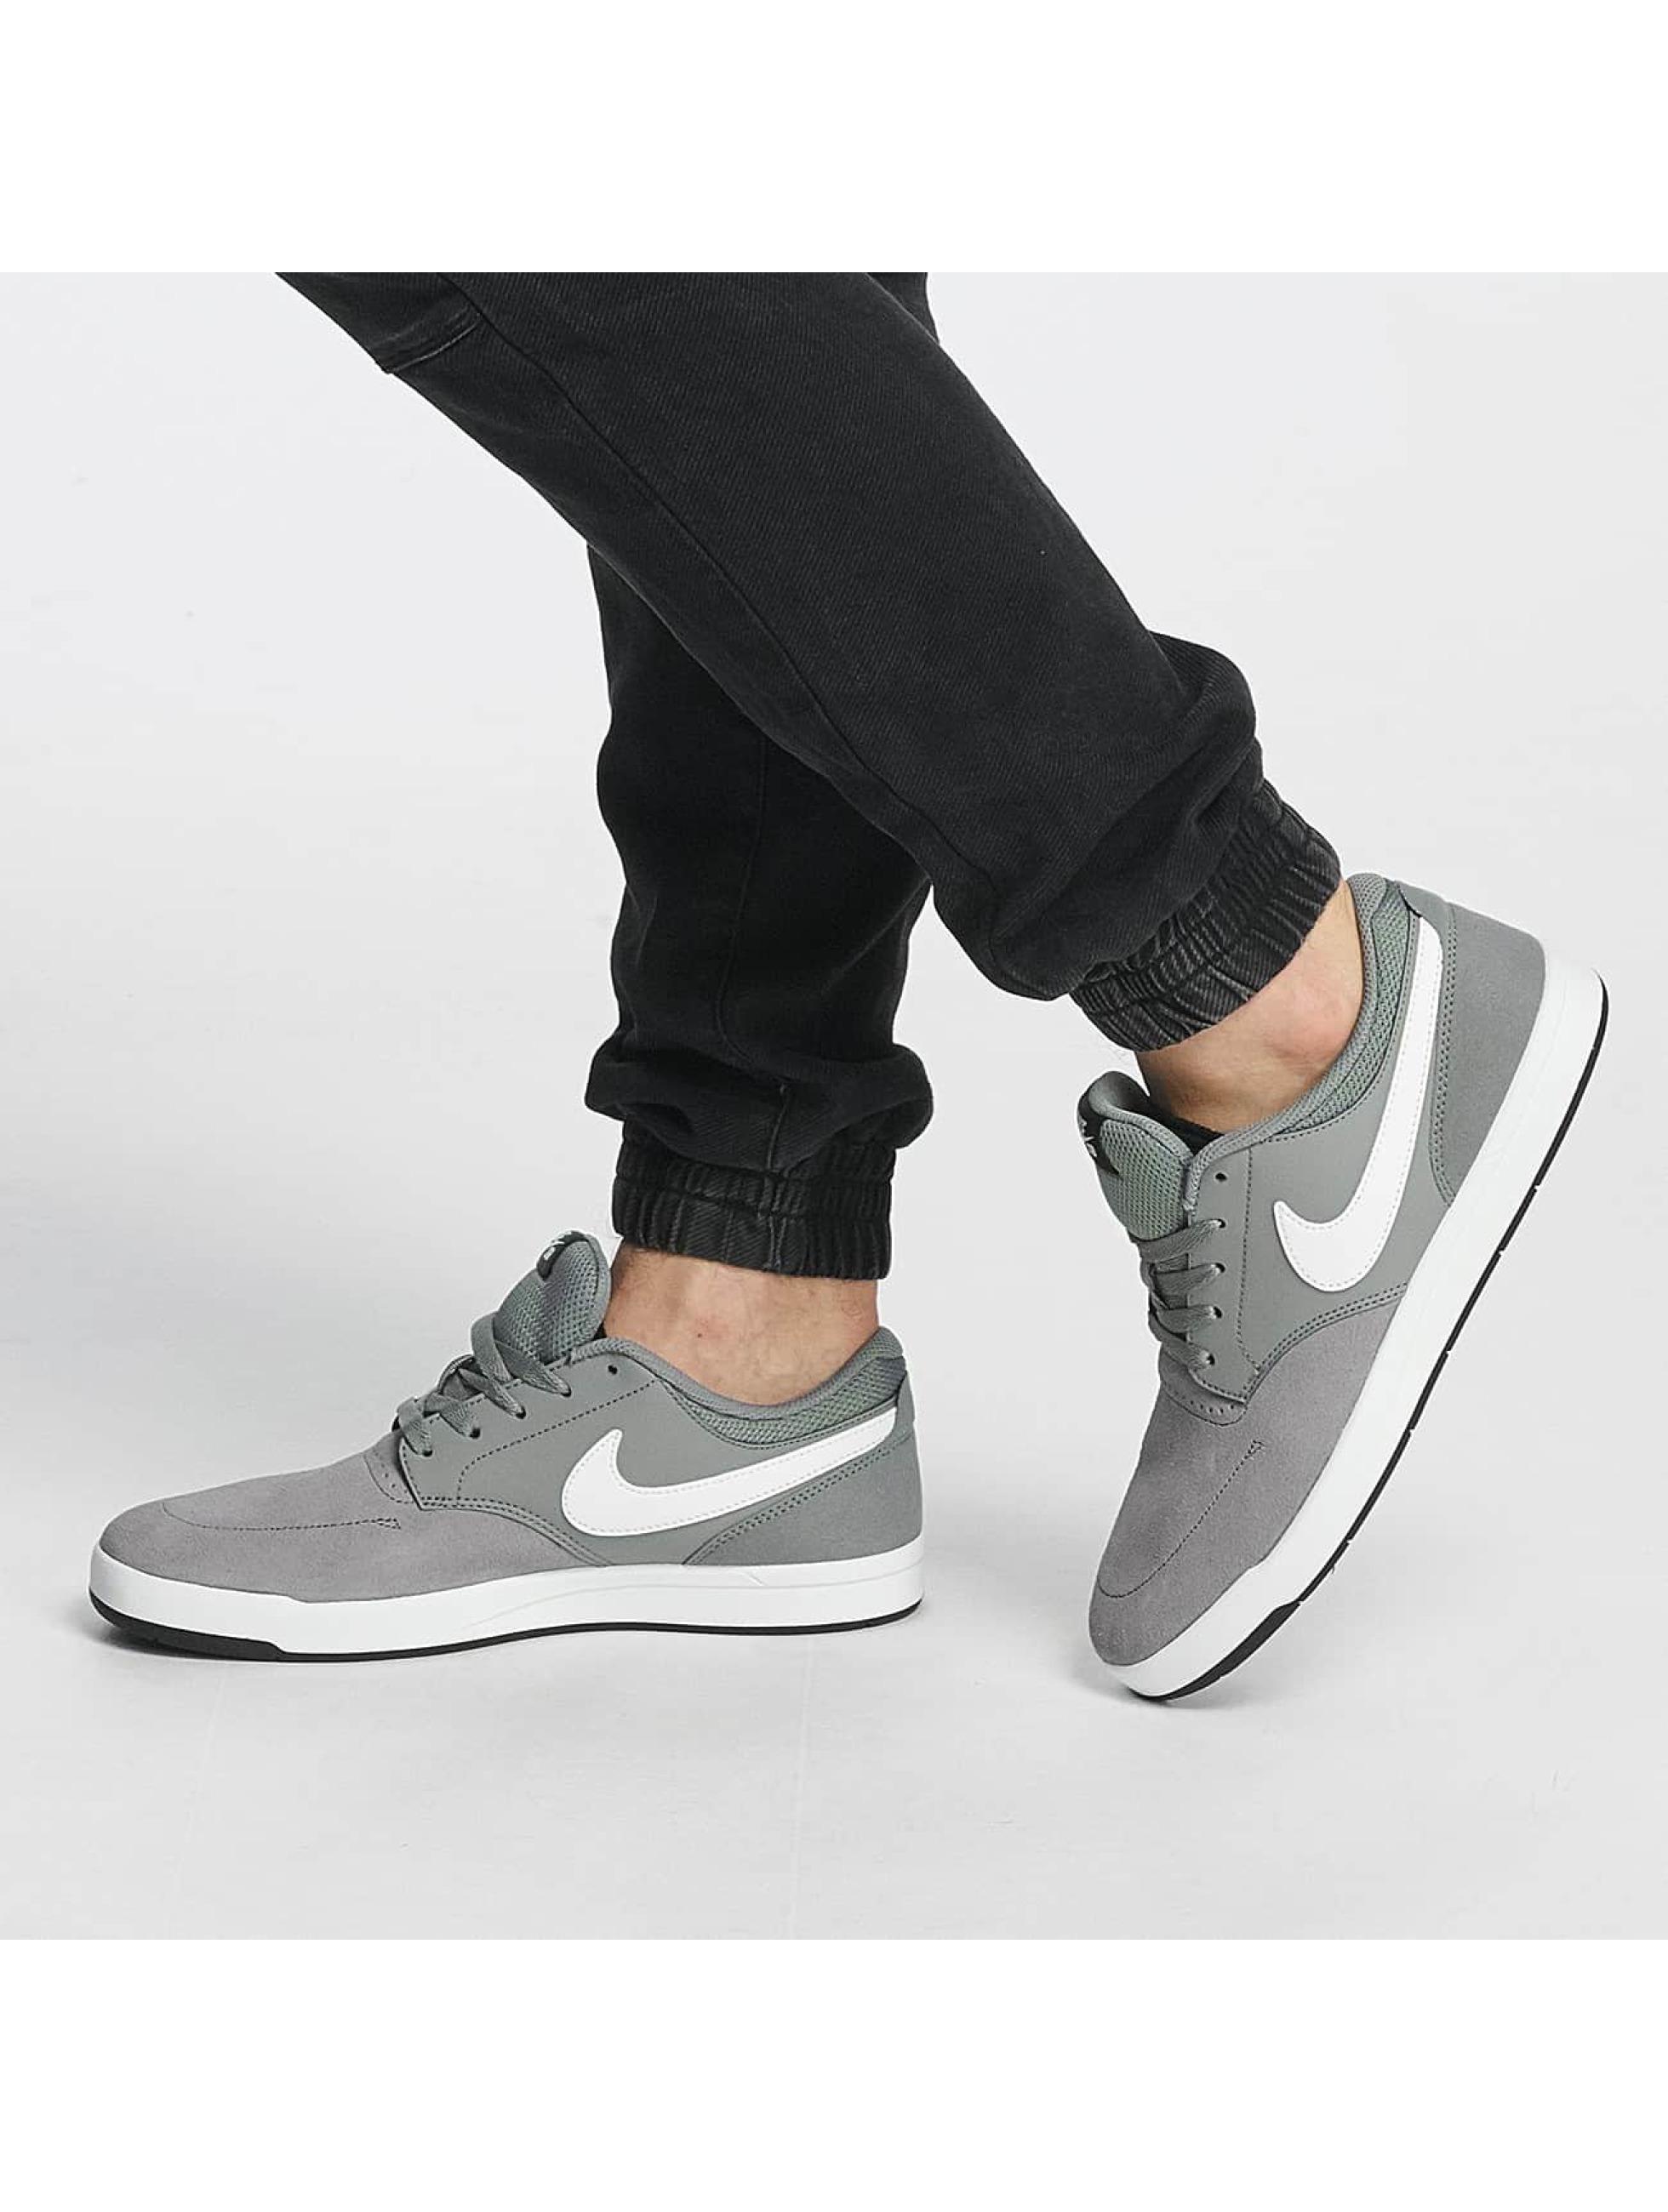 Nike SB Zapatillas de deporte Fokus Skateboarding gris